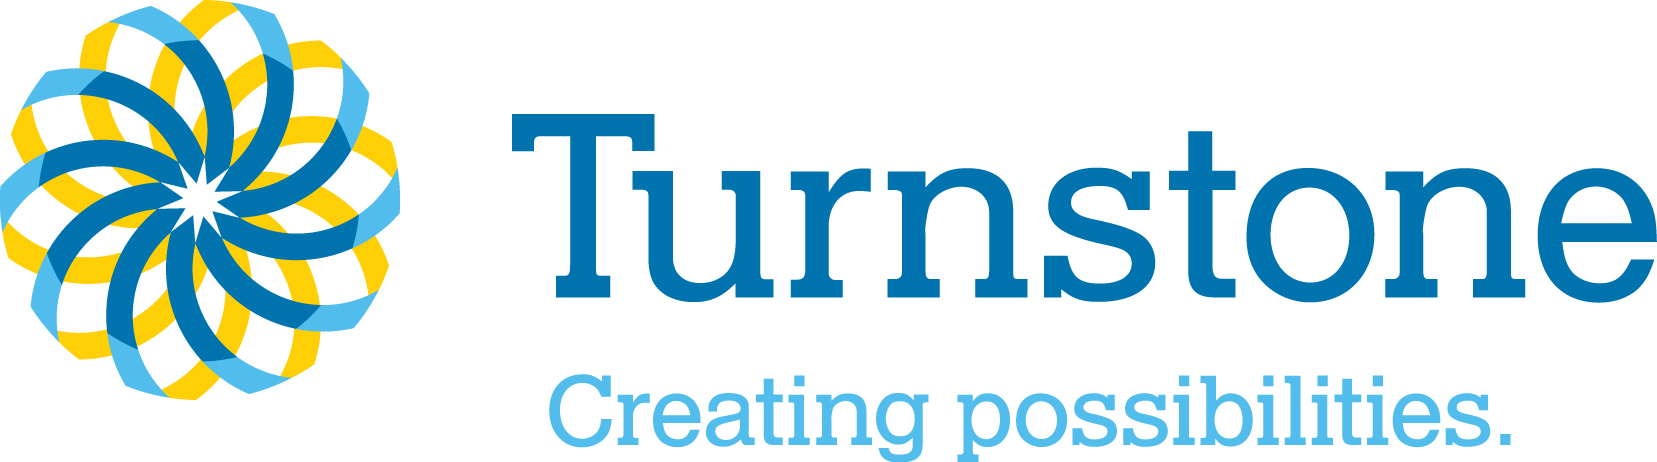 Turnstone_Horz_tagline.jpg